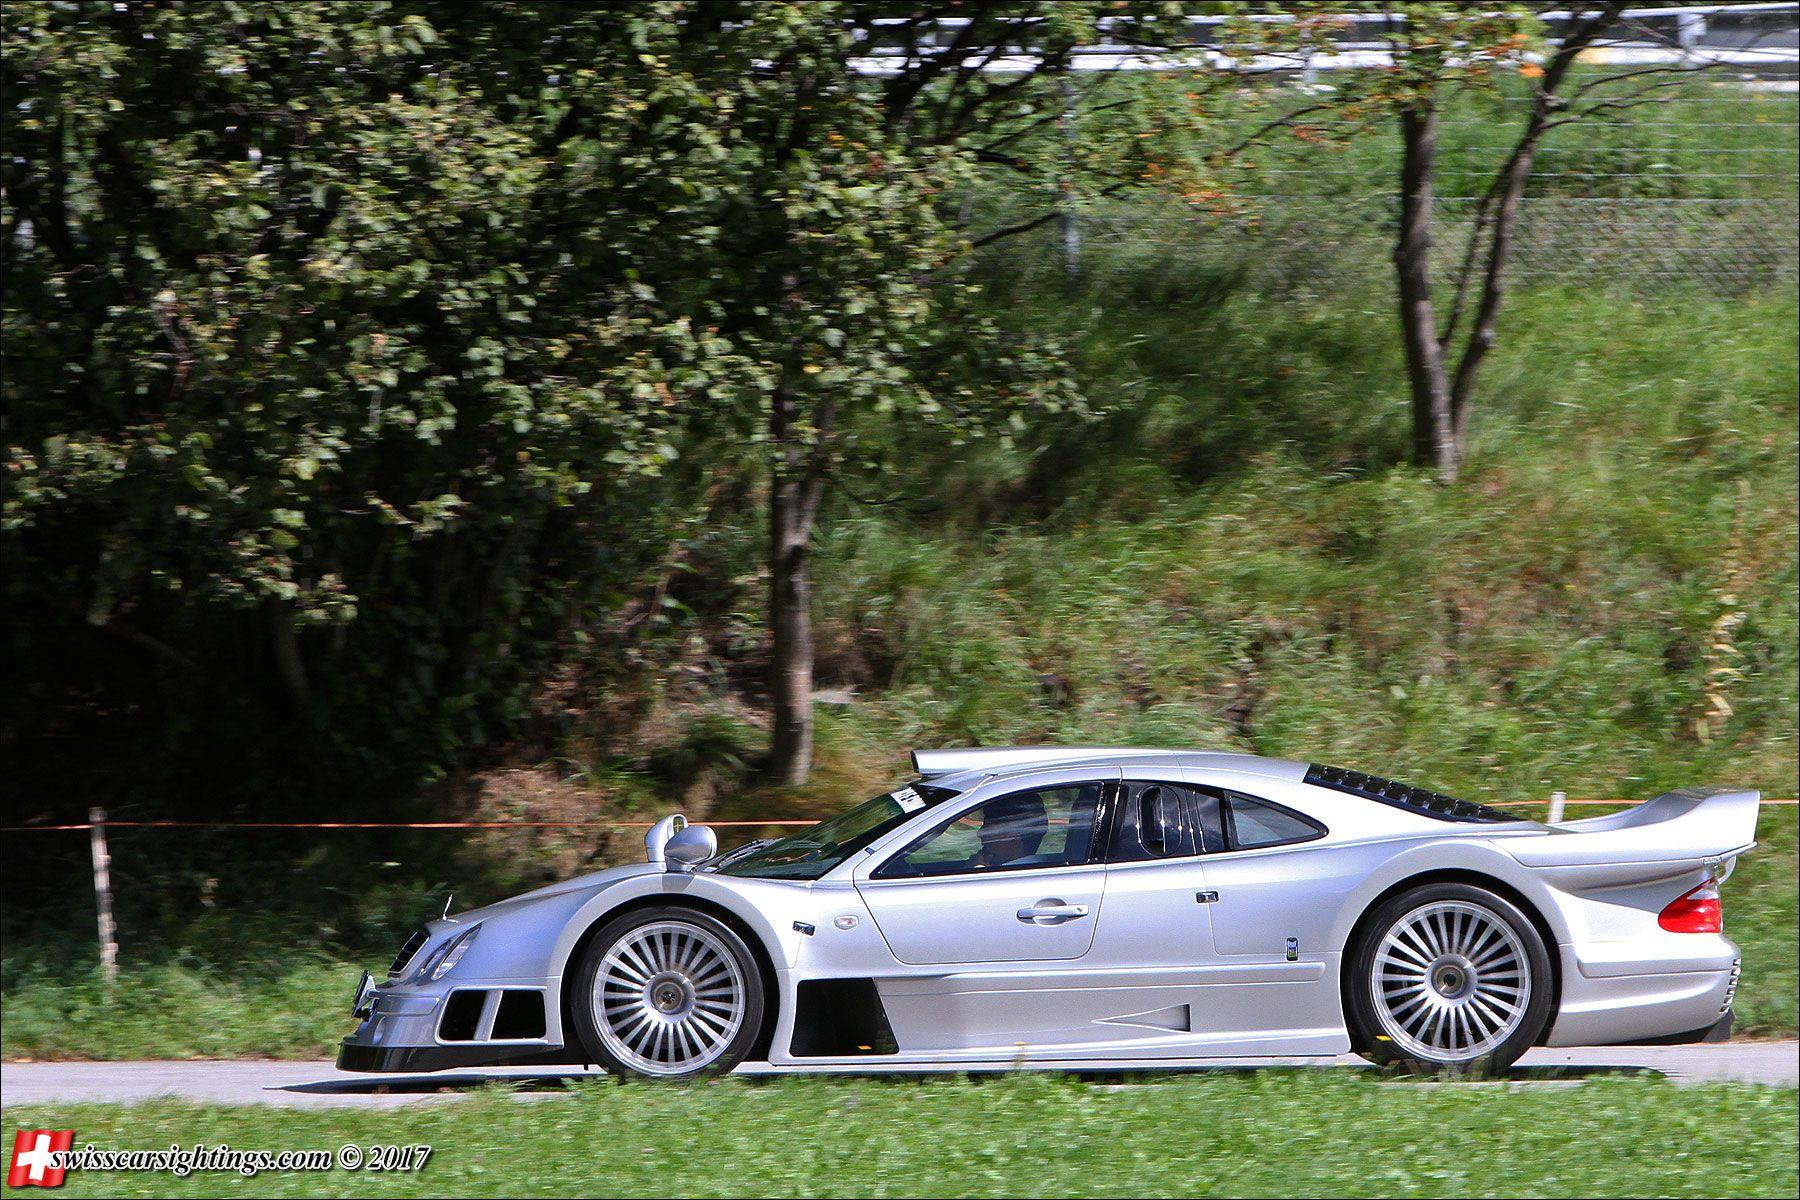 4396d050fb79ee26caeaec2433295dd2 Outstanding Maisto Porsche 911 Gt1 Le Mans 1998 Cars Trend